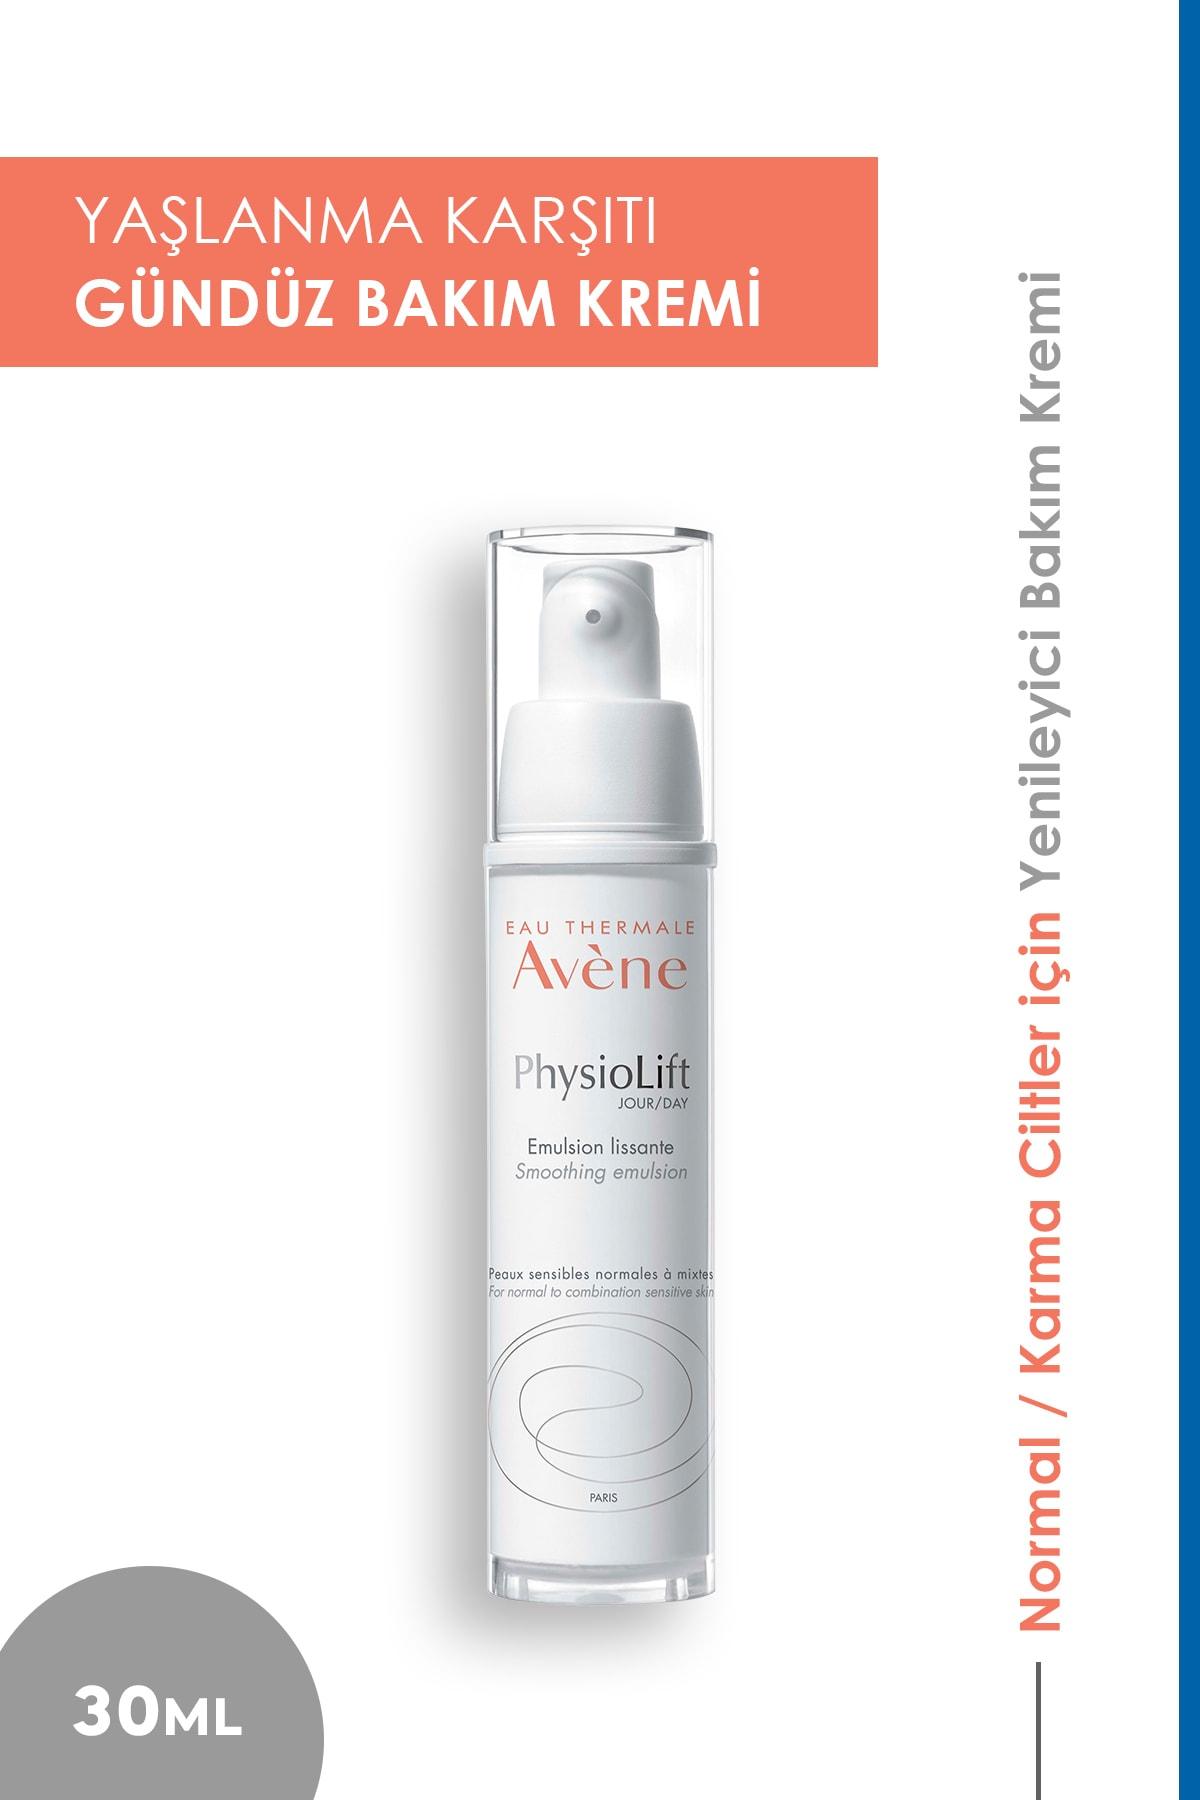 Avene Physiolift Jour Day Emulsion 30 ml - Karma Ciltler İçin 1